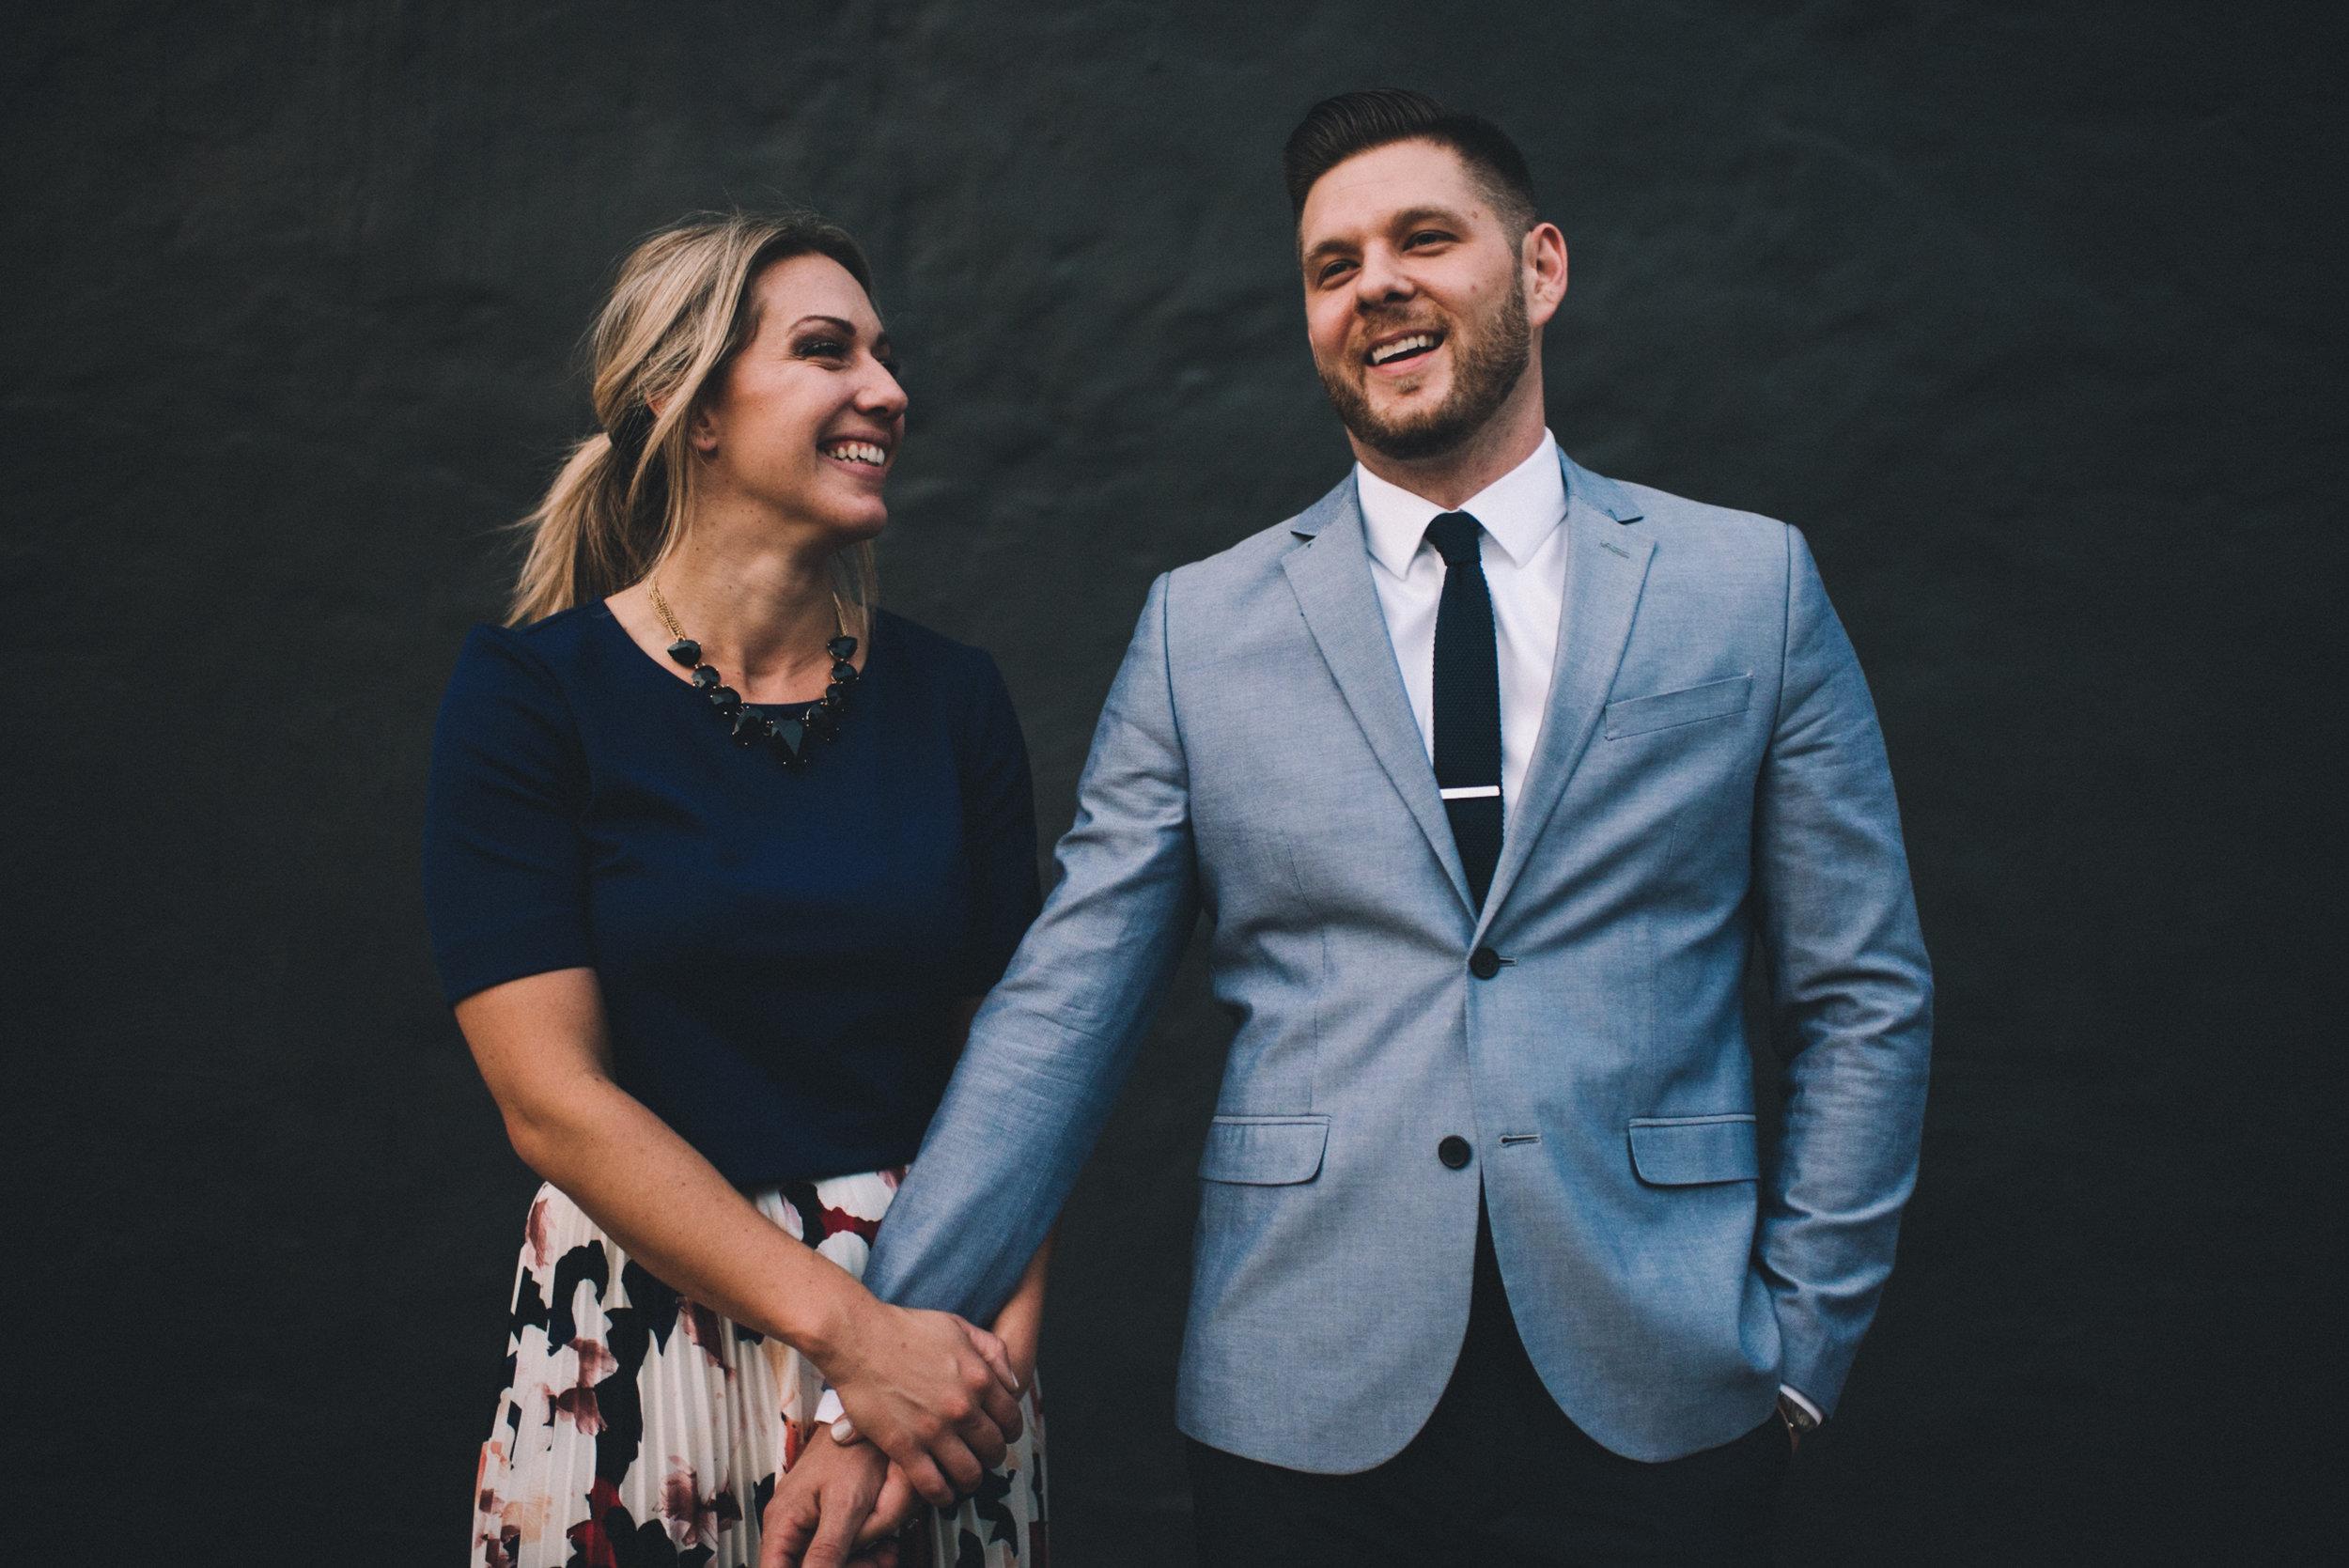 Pittsburgh Wedding Photographer - Stirpe-199.jpg